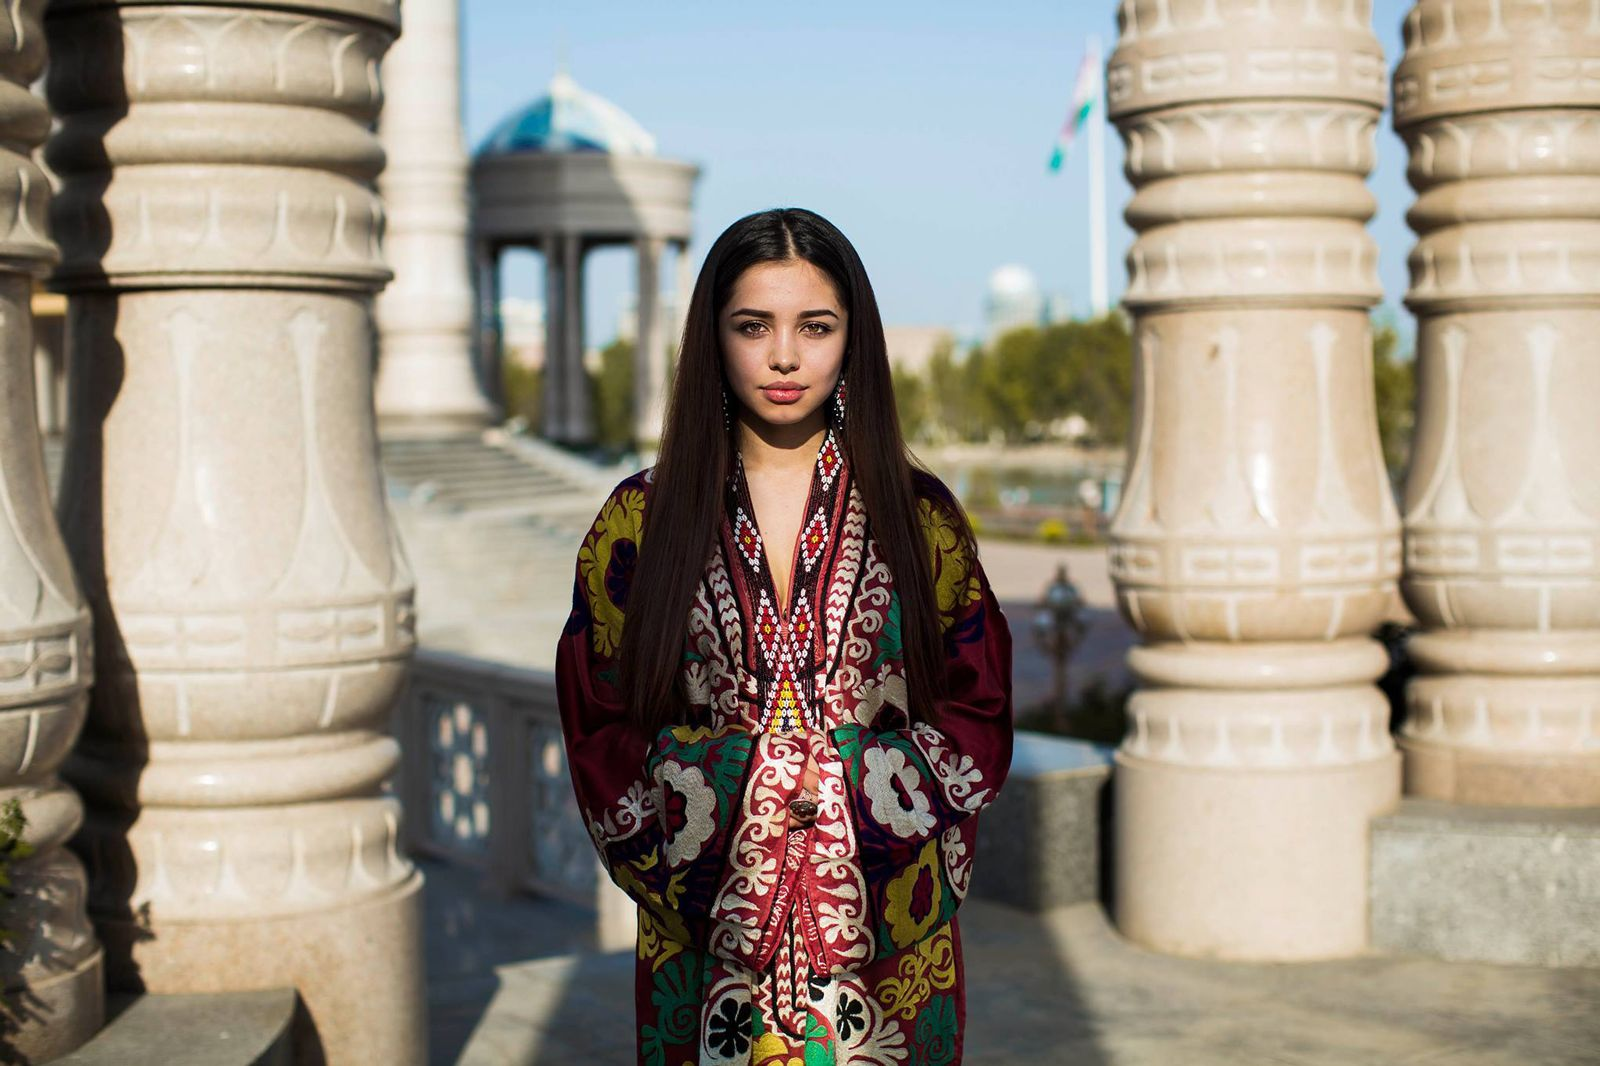 узбекские красавицы на фото - 10